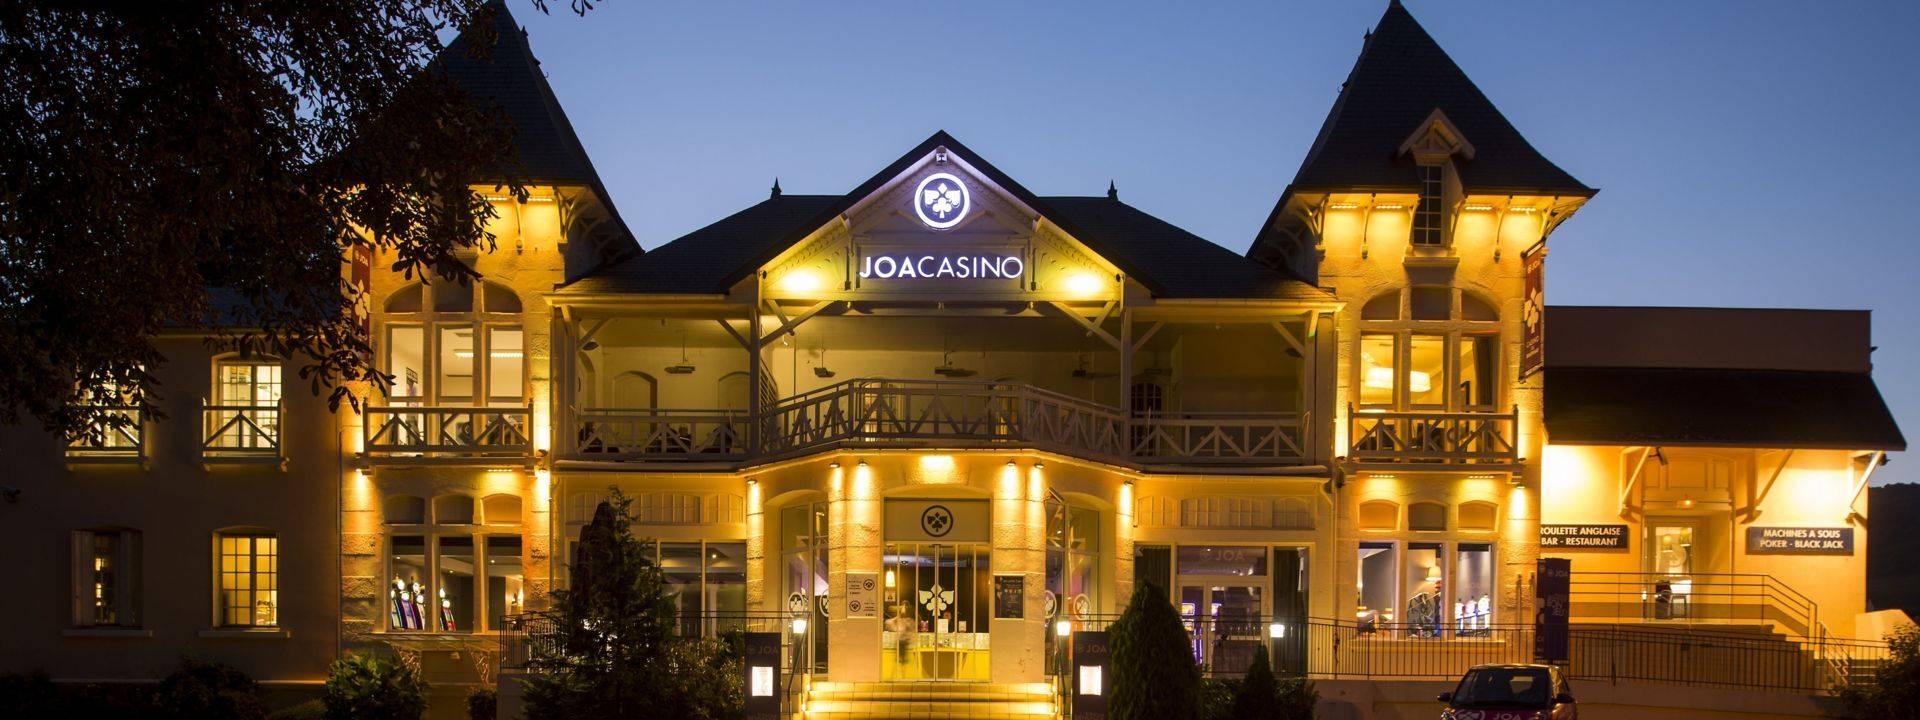 Joa club casino santenay myvegas slots app not working